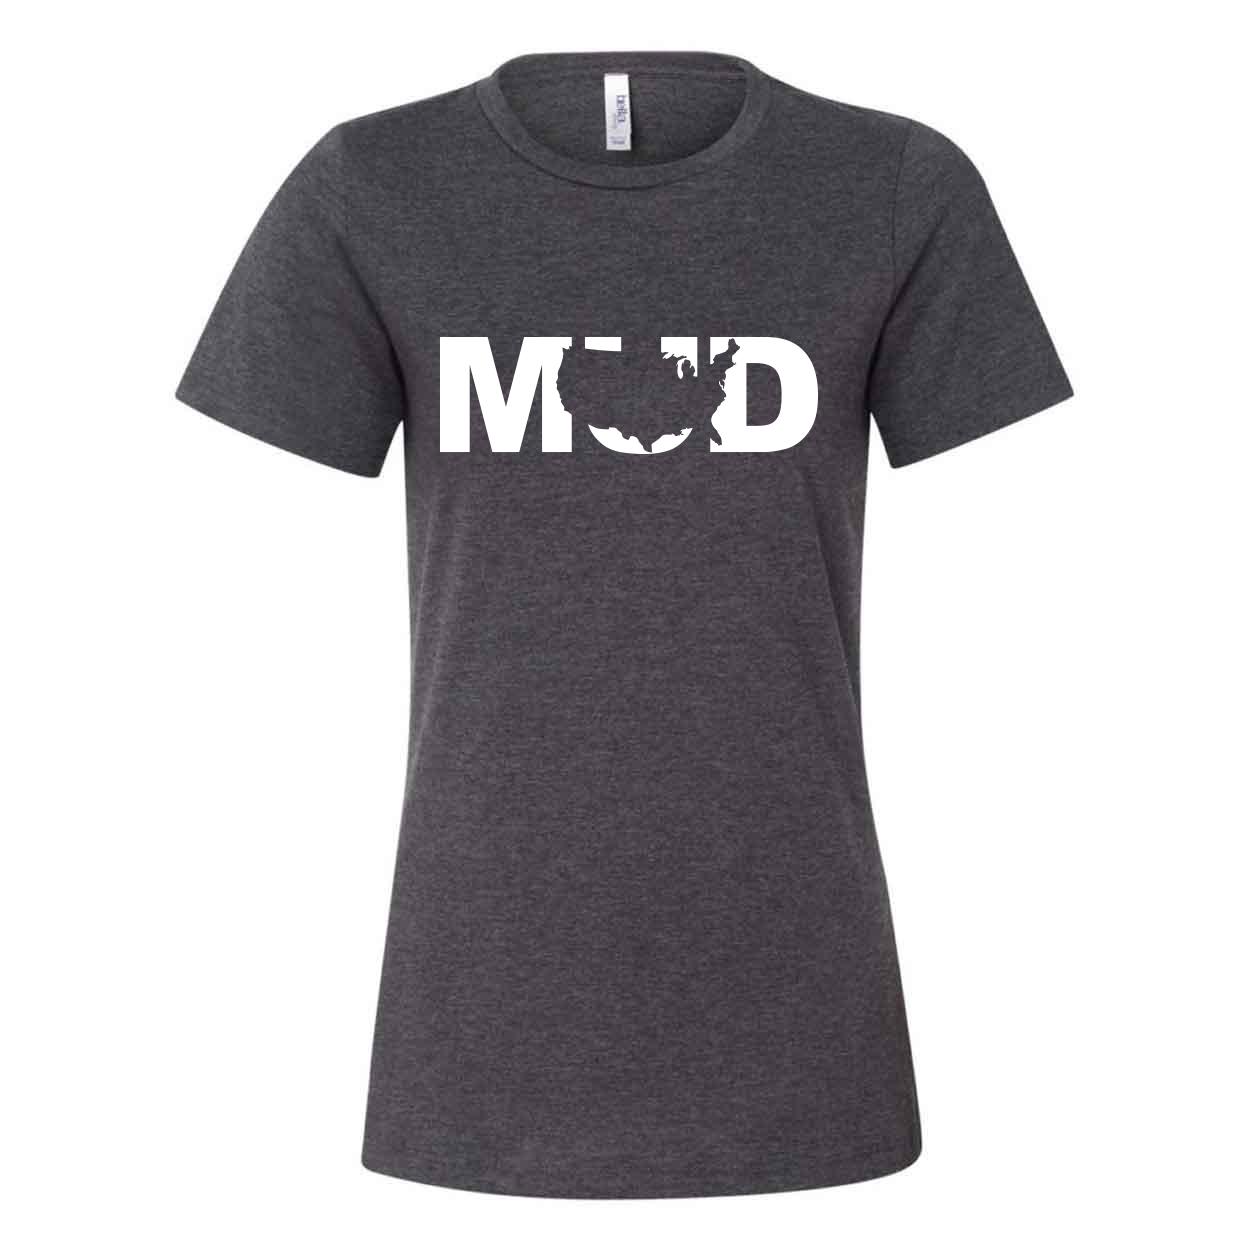 Mud United States Classic Women's Relaxed Jersey T-Shirt Dark Gray Heather (White Logo)